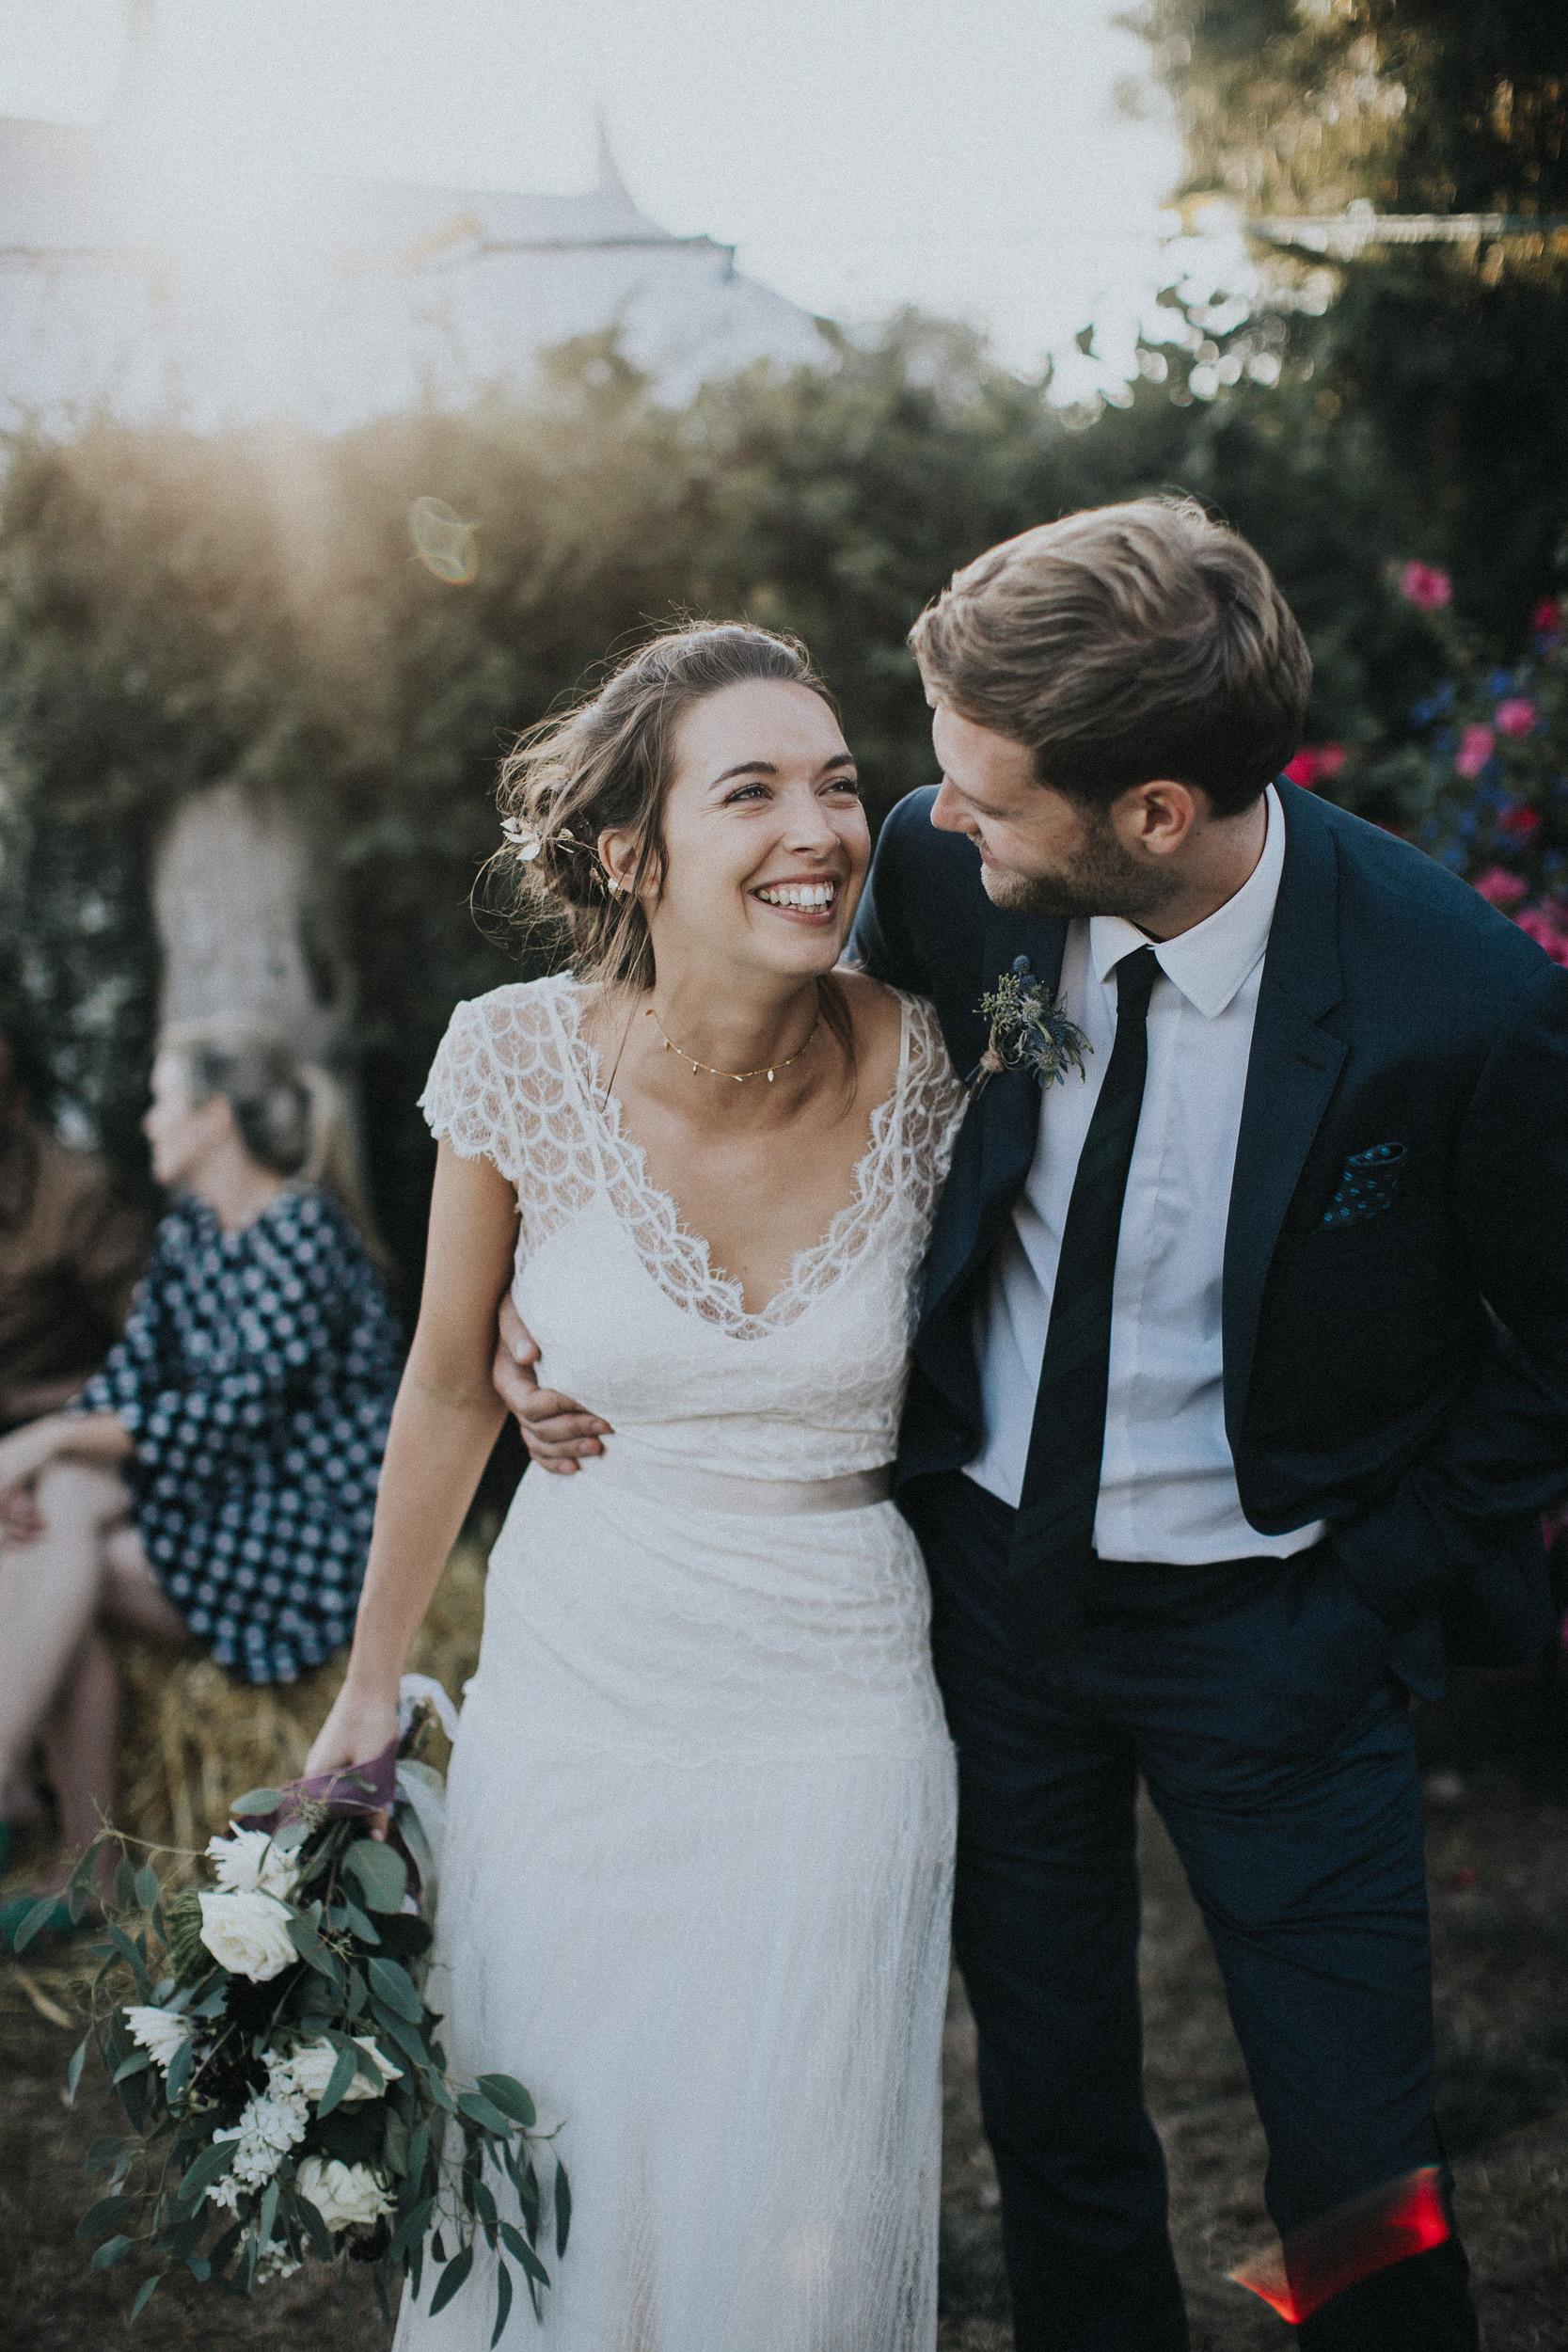 Martha-Laid-Back-Garden-Wedding-Lace-Wedding-Dress-Bohemian-Kate-Beaumont-58.jpg